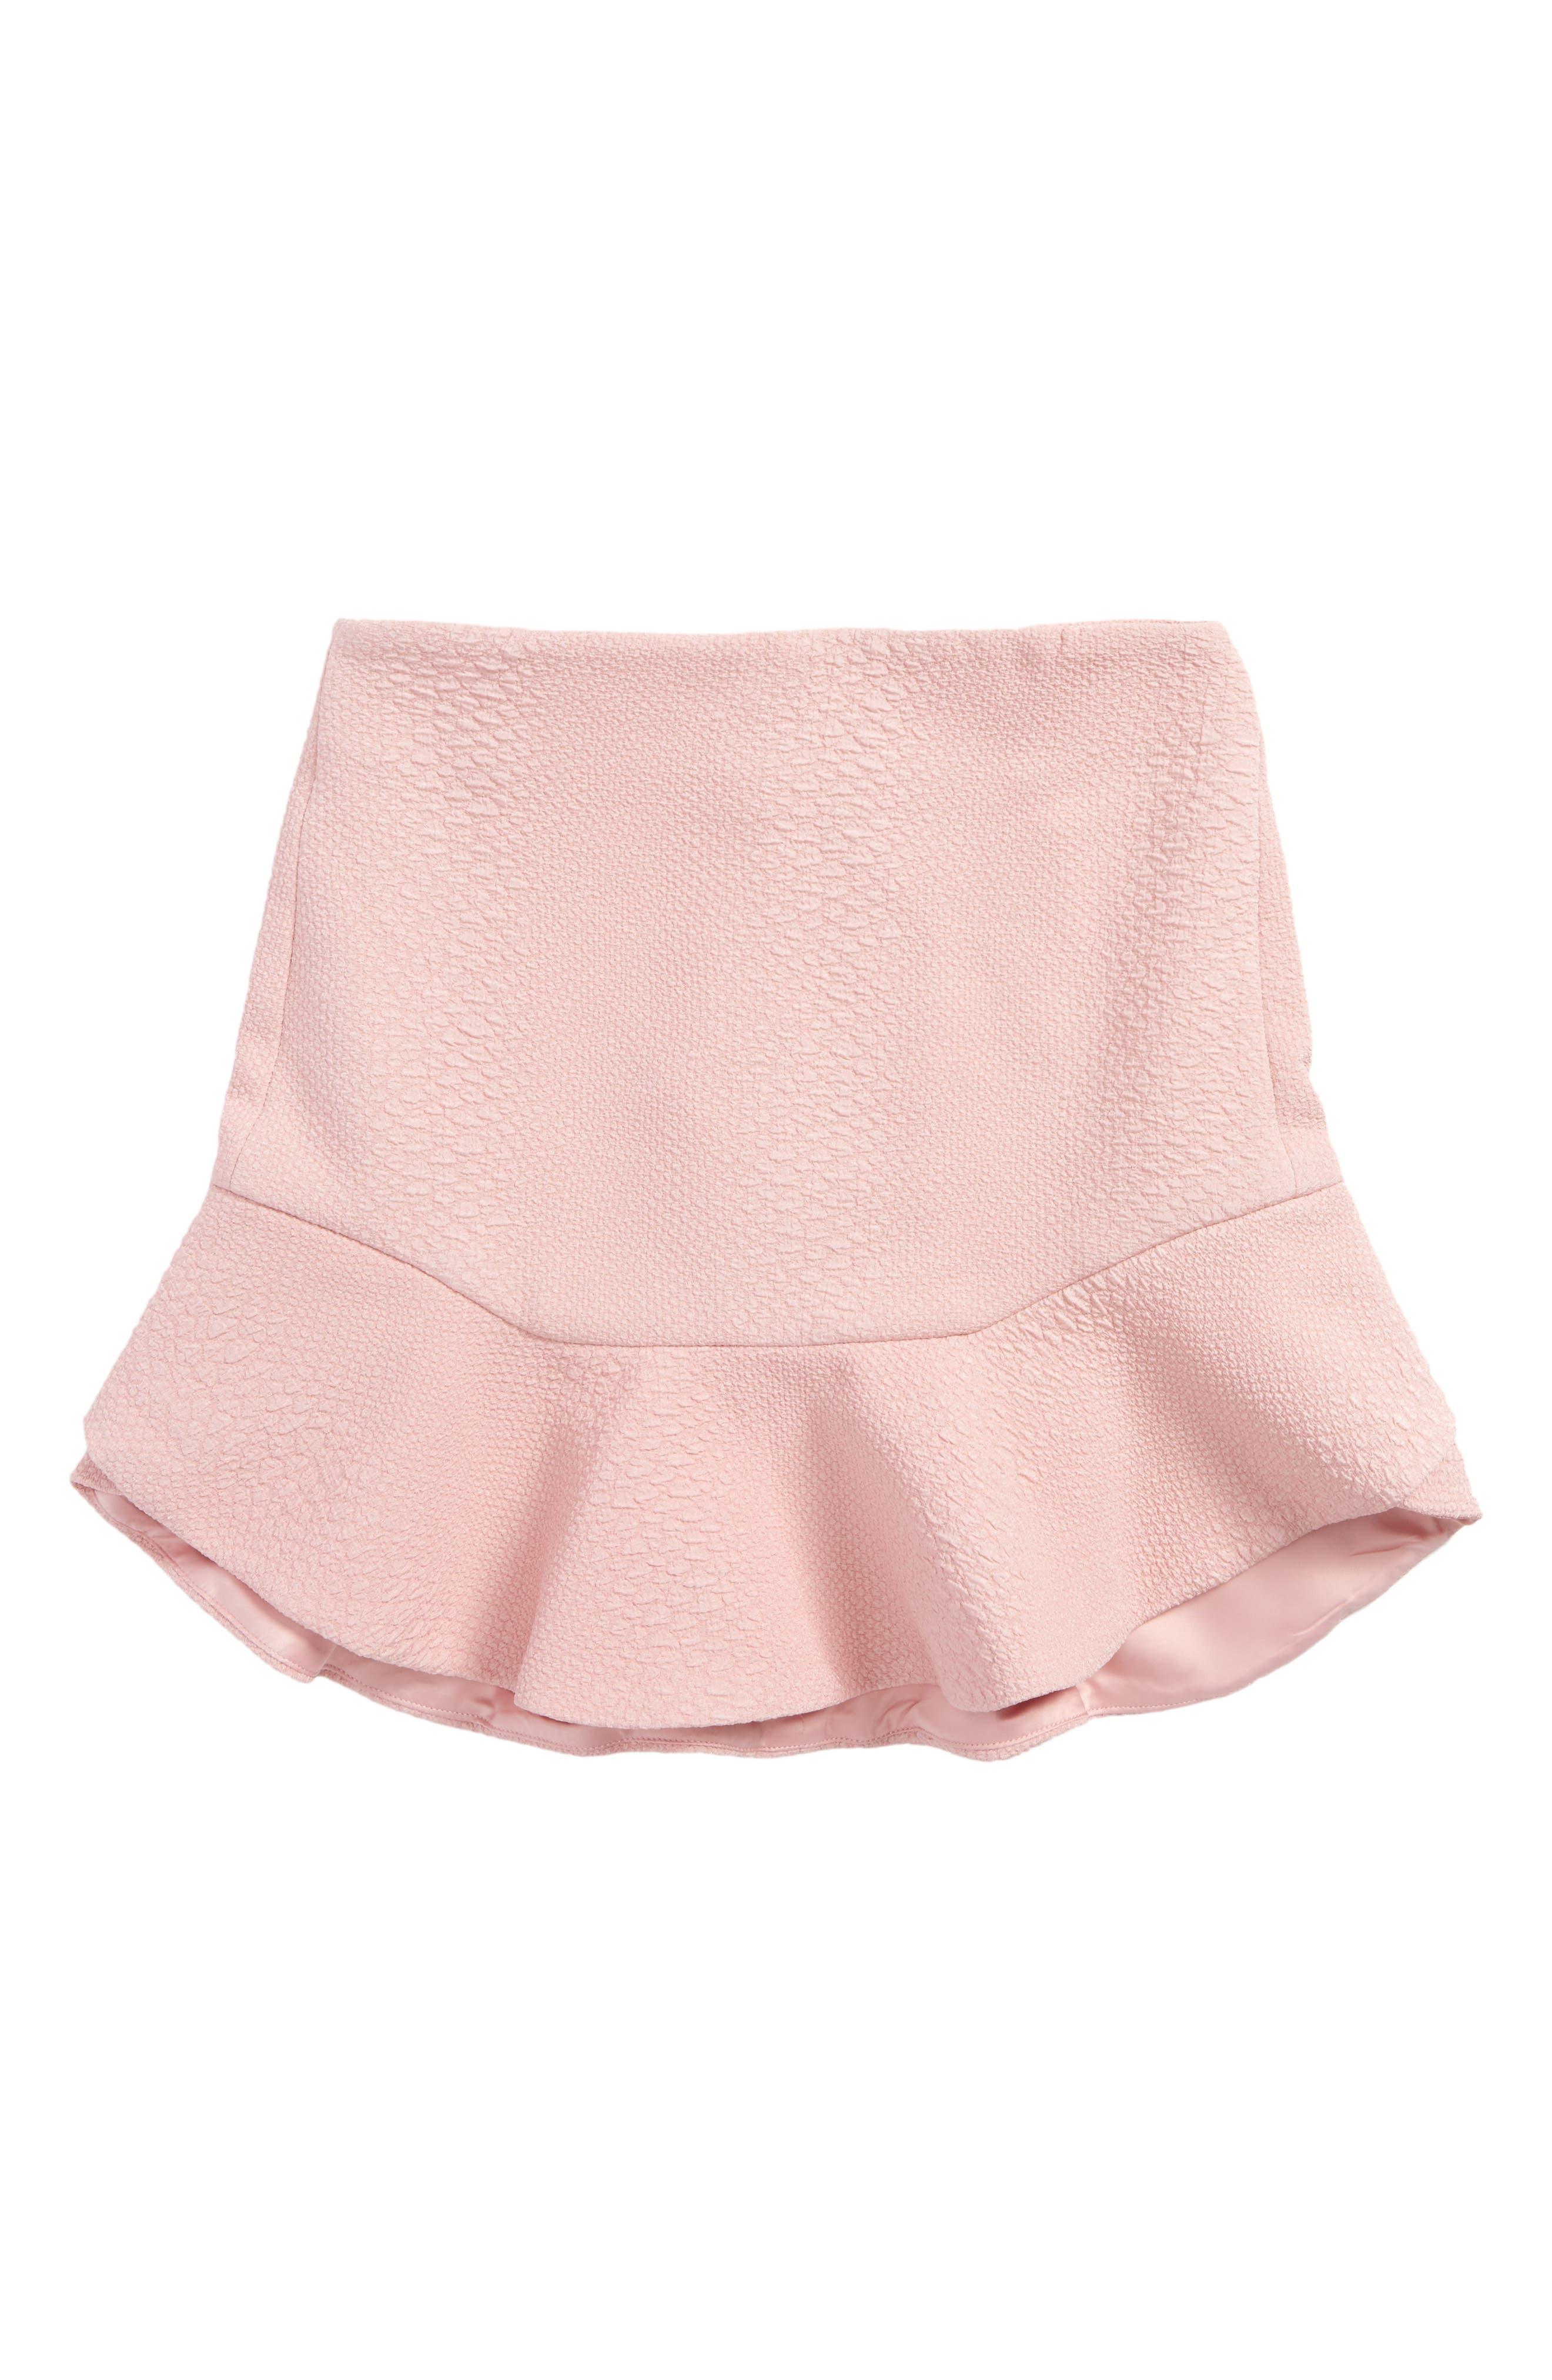 Frill Skirt,                         Main,                         color, 684